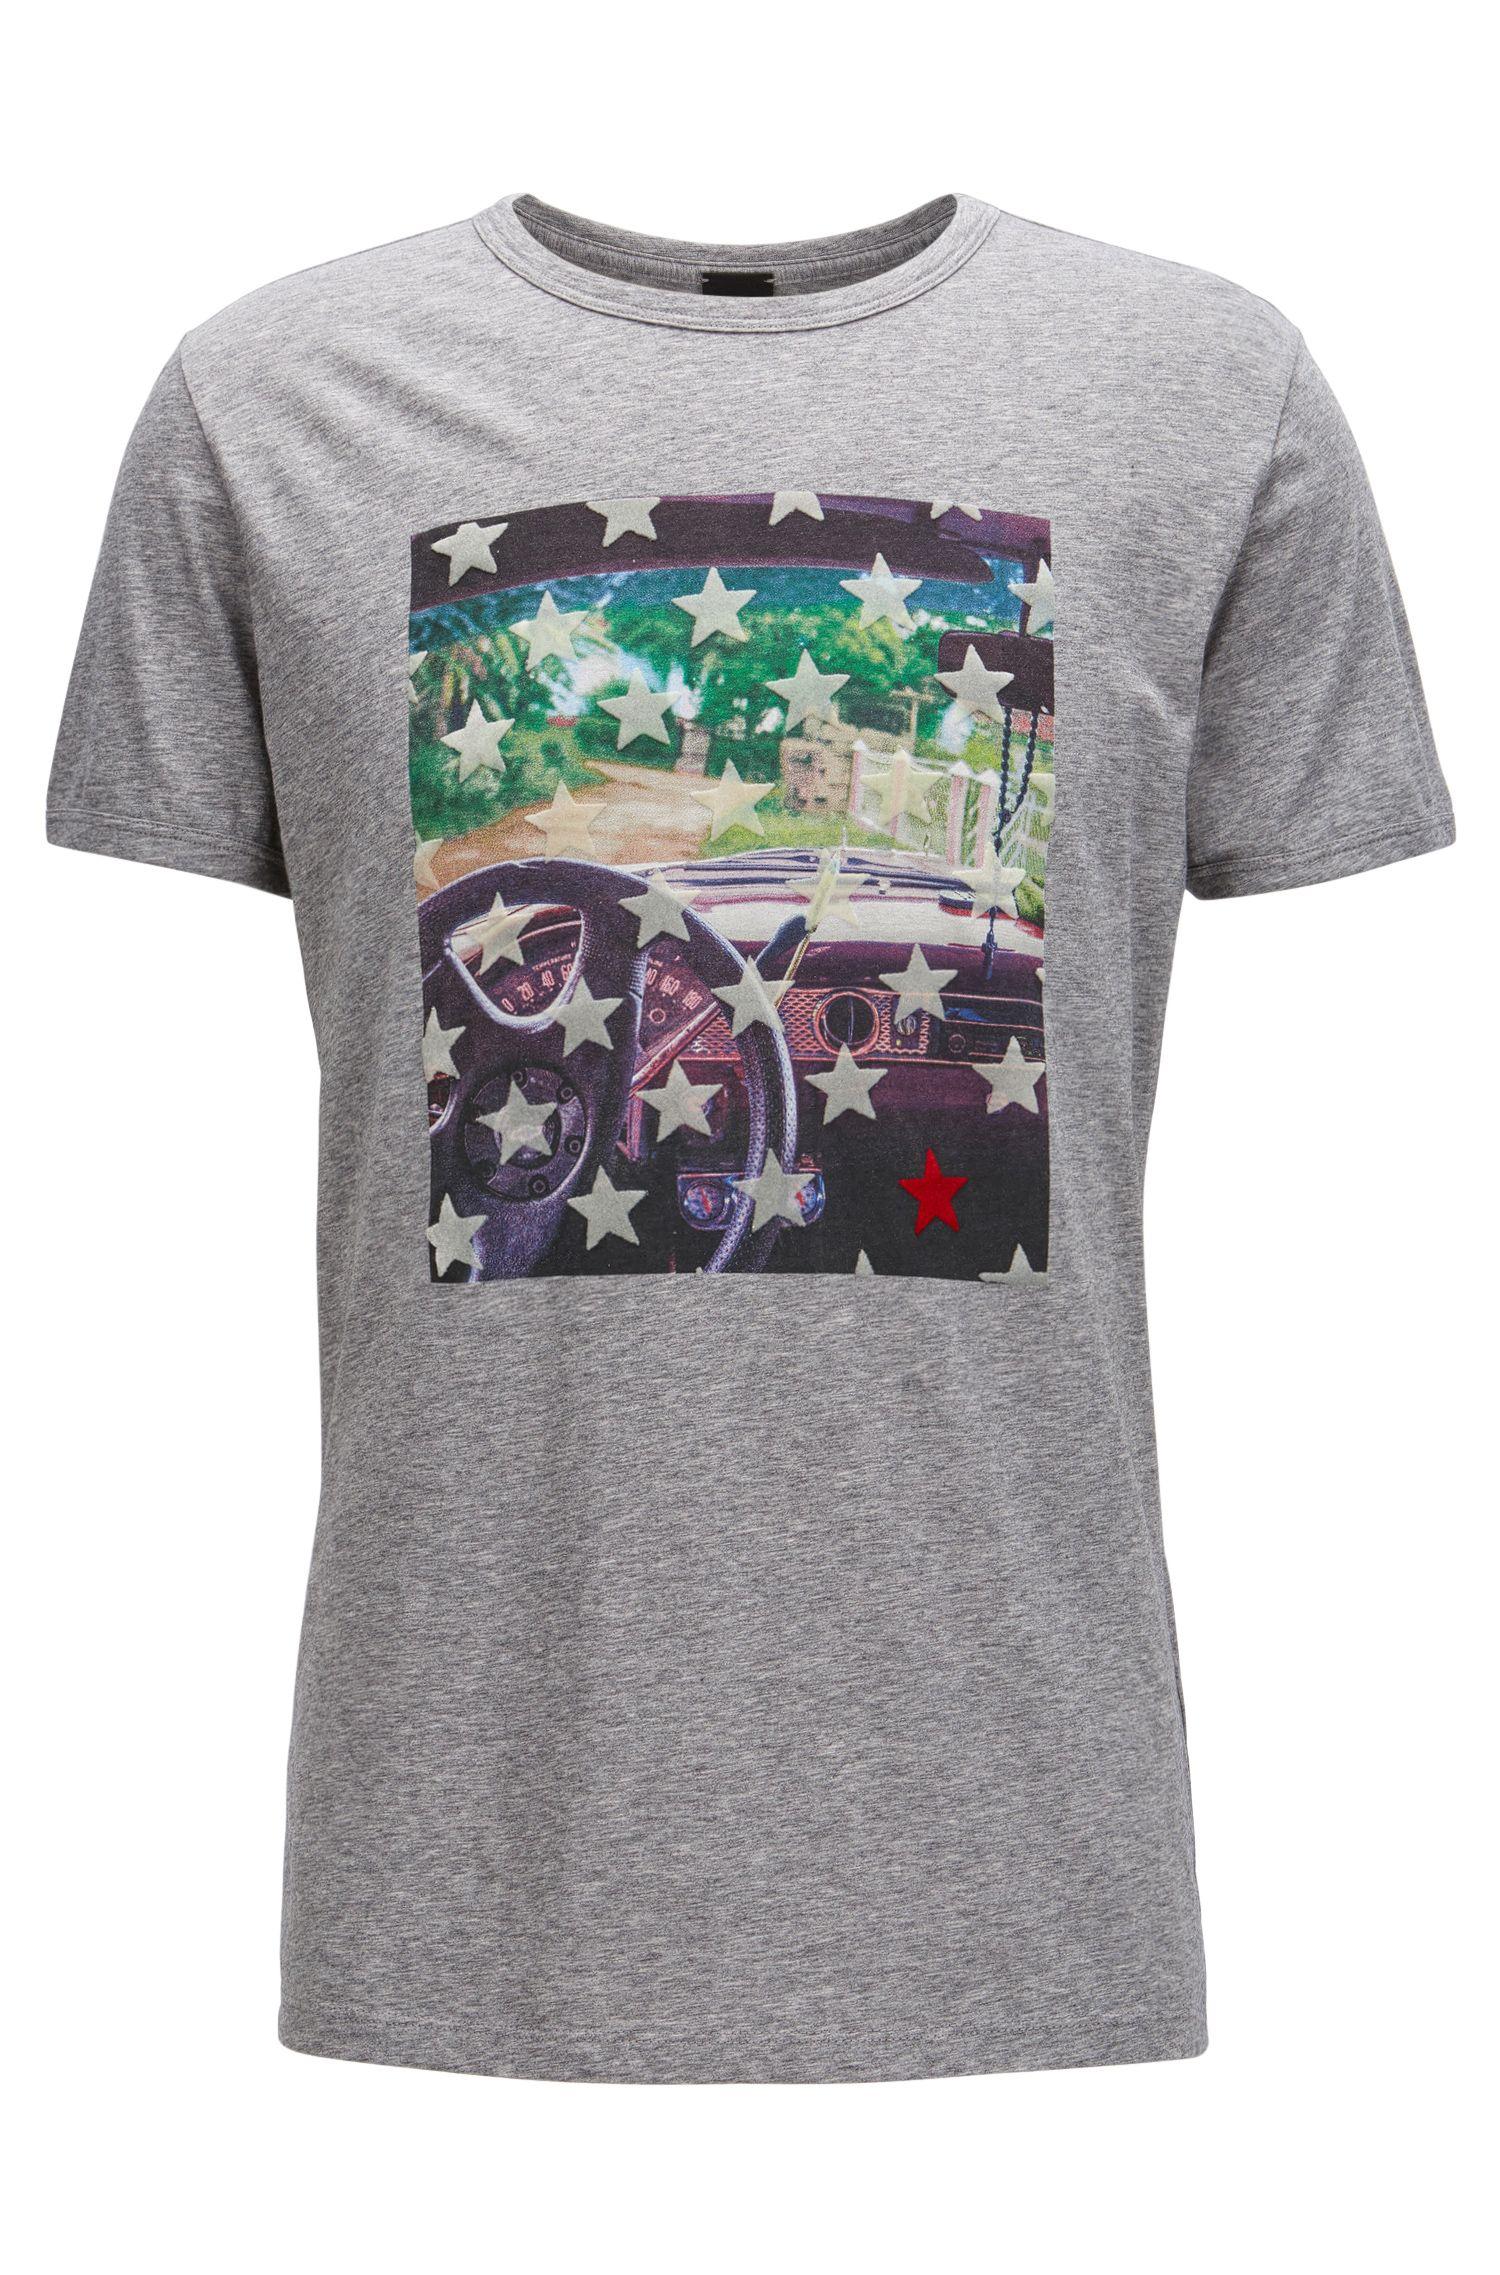 Cotton Graphic T-Shirt | Turbulent, Light Grey